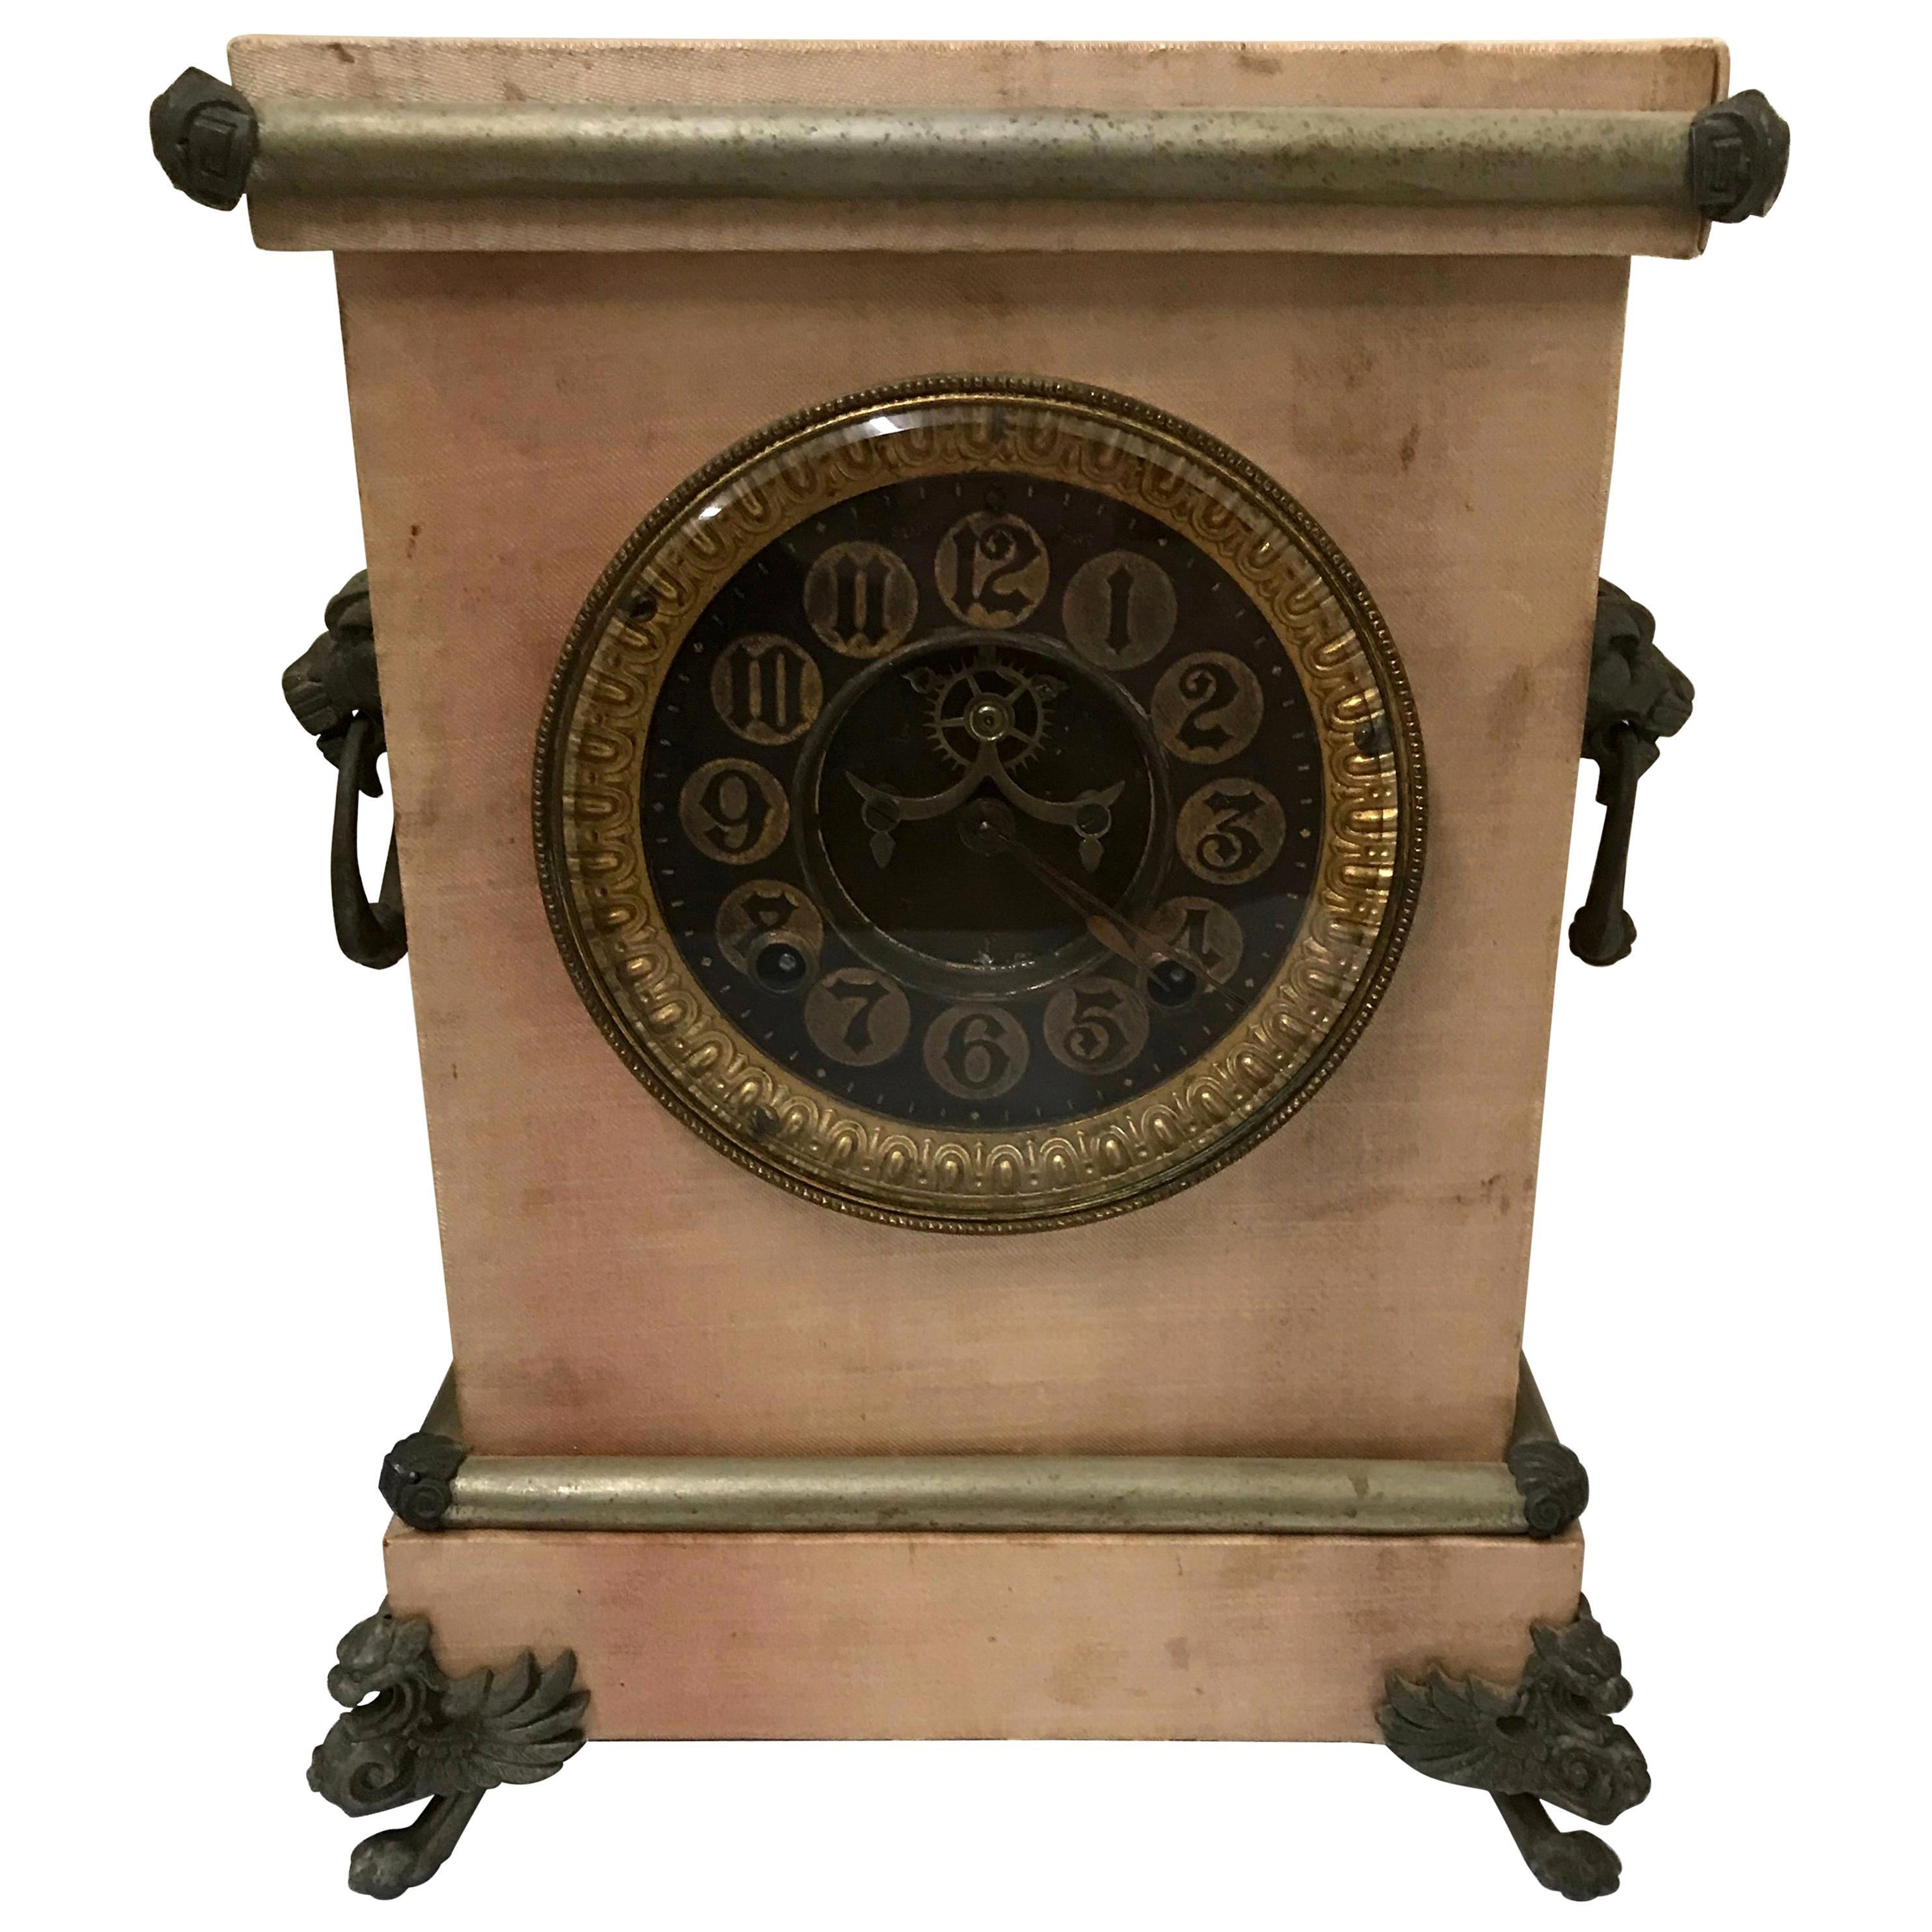 Ansonia Mantel Clock with Satin Finish, Late 19th Century